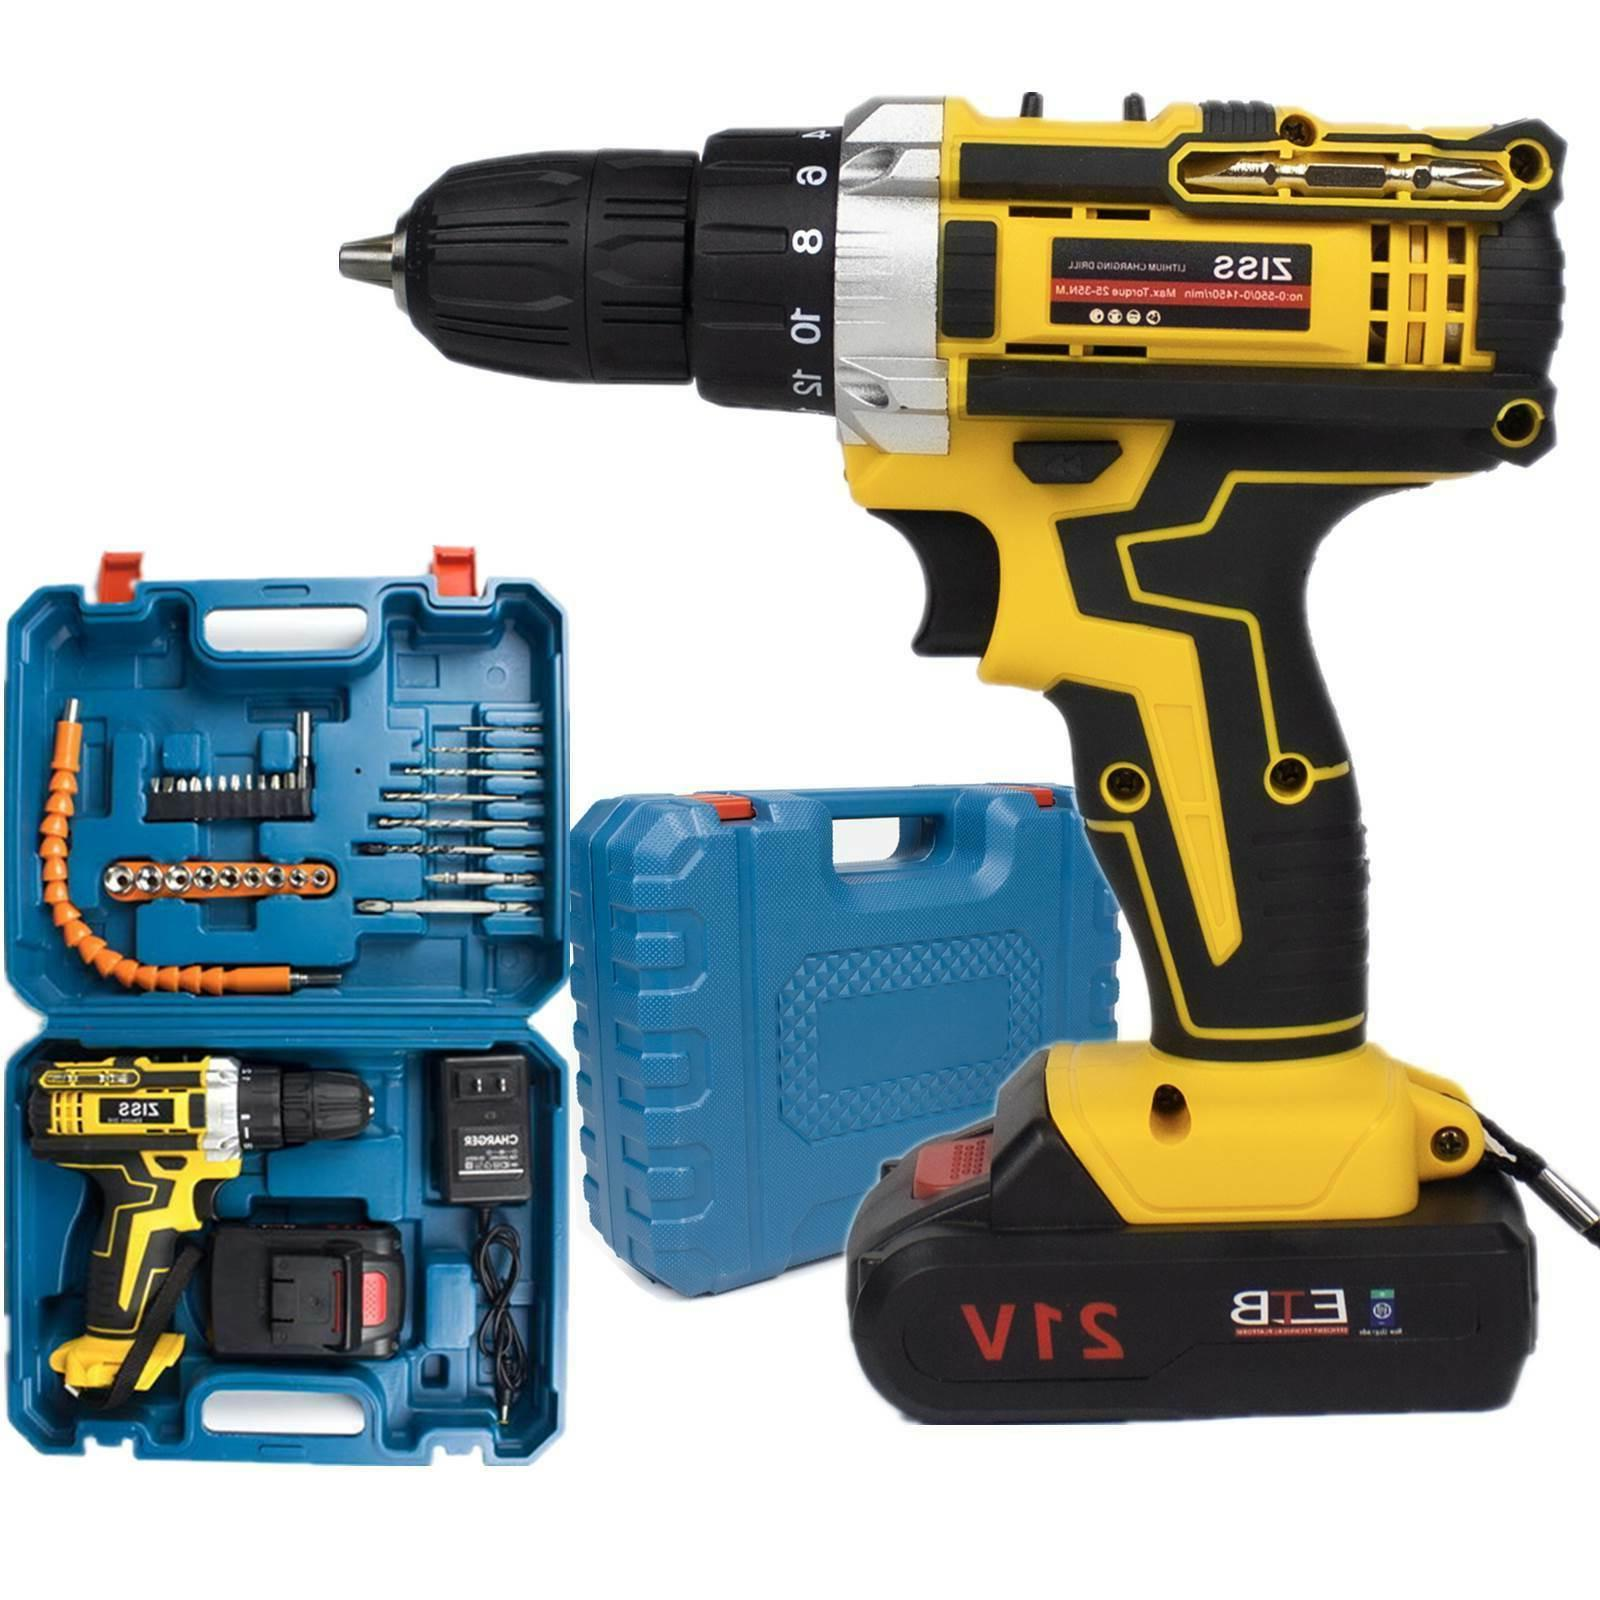 21v cordless drill electric screwdriver 30pcs drill